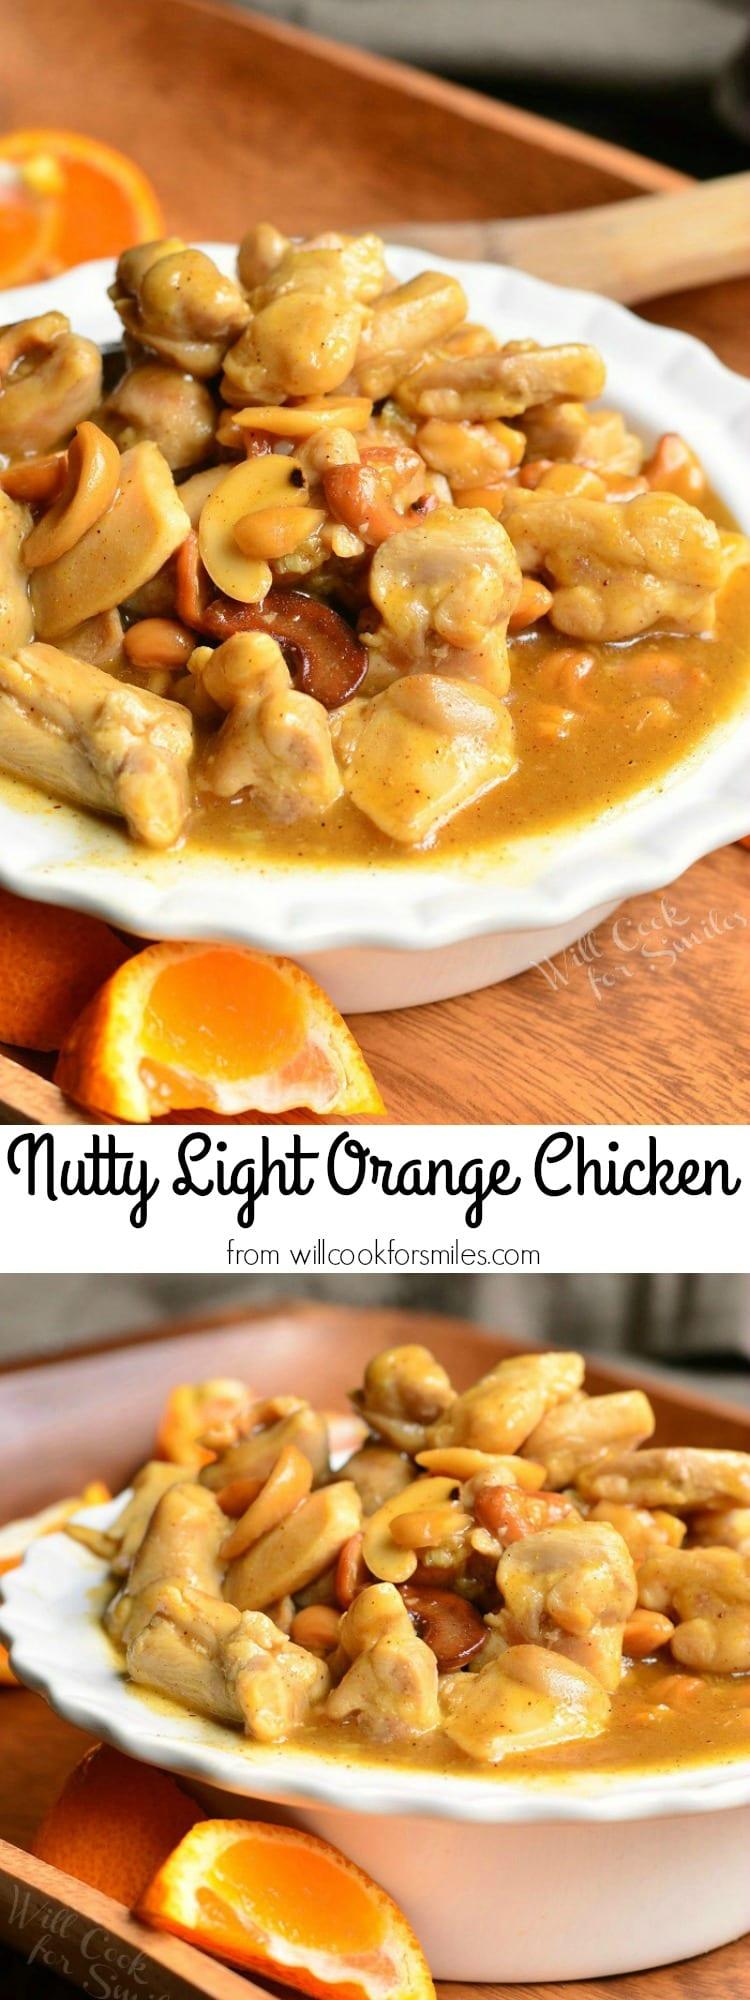 Nutty Light Orange Chicken 5 from willcookforsmiles.com